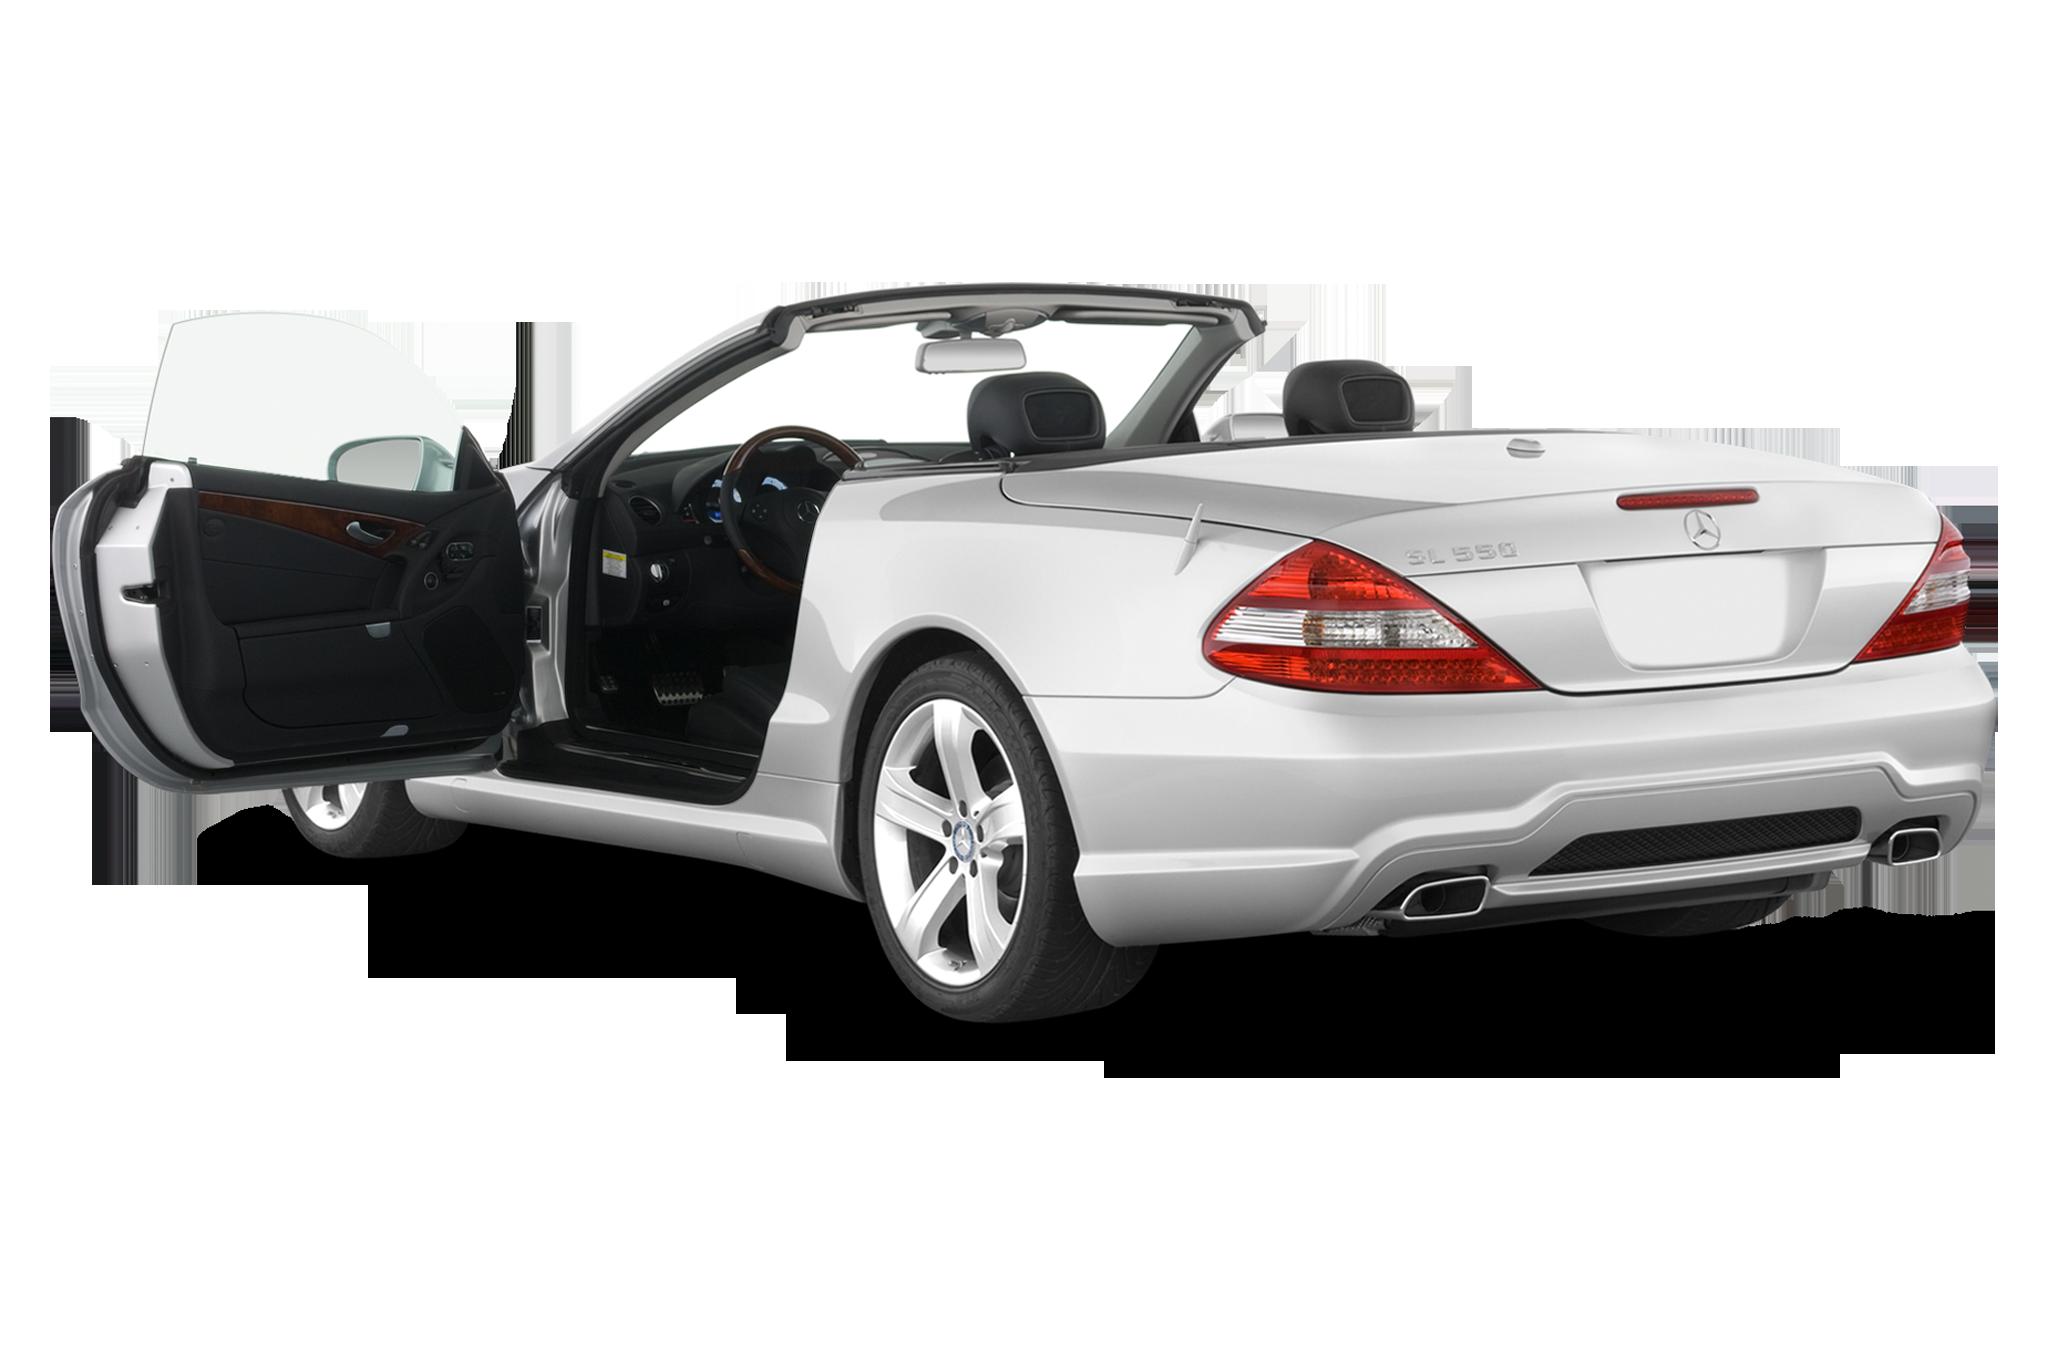 2011 Mercedes Benz SL550 - Mercedes Benz Luxury Convertible Review - Automobile Magazine